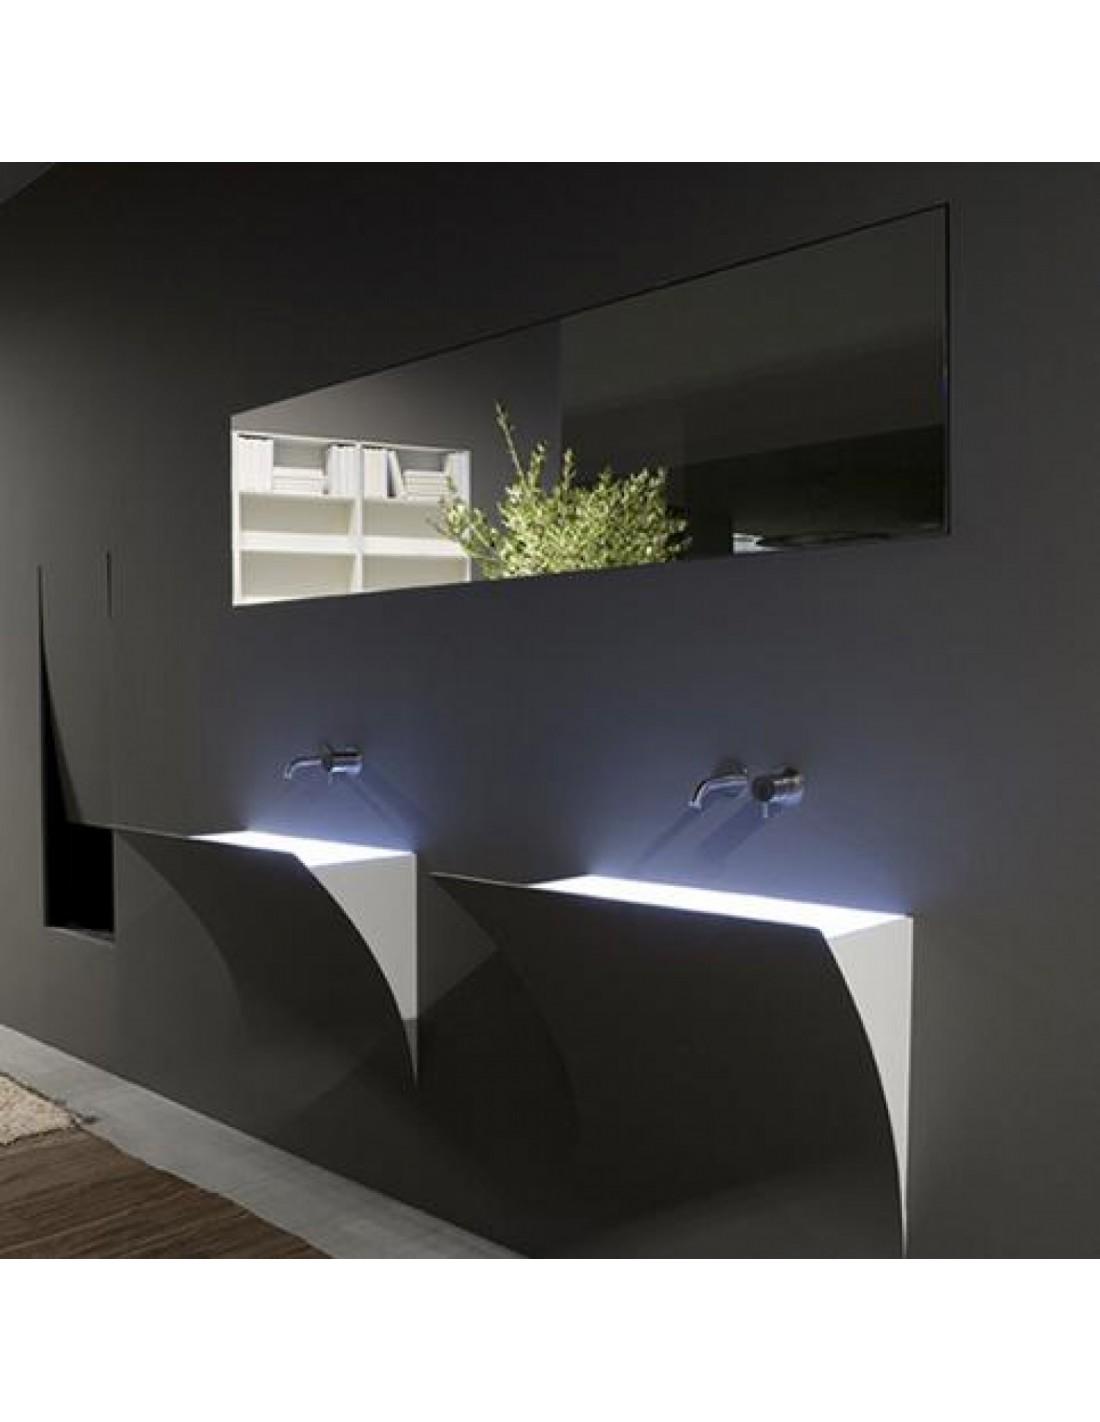 Armoire De Toilette Segreto Antonio Lupi Valente Design